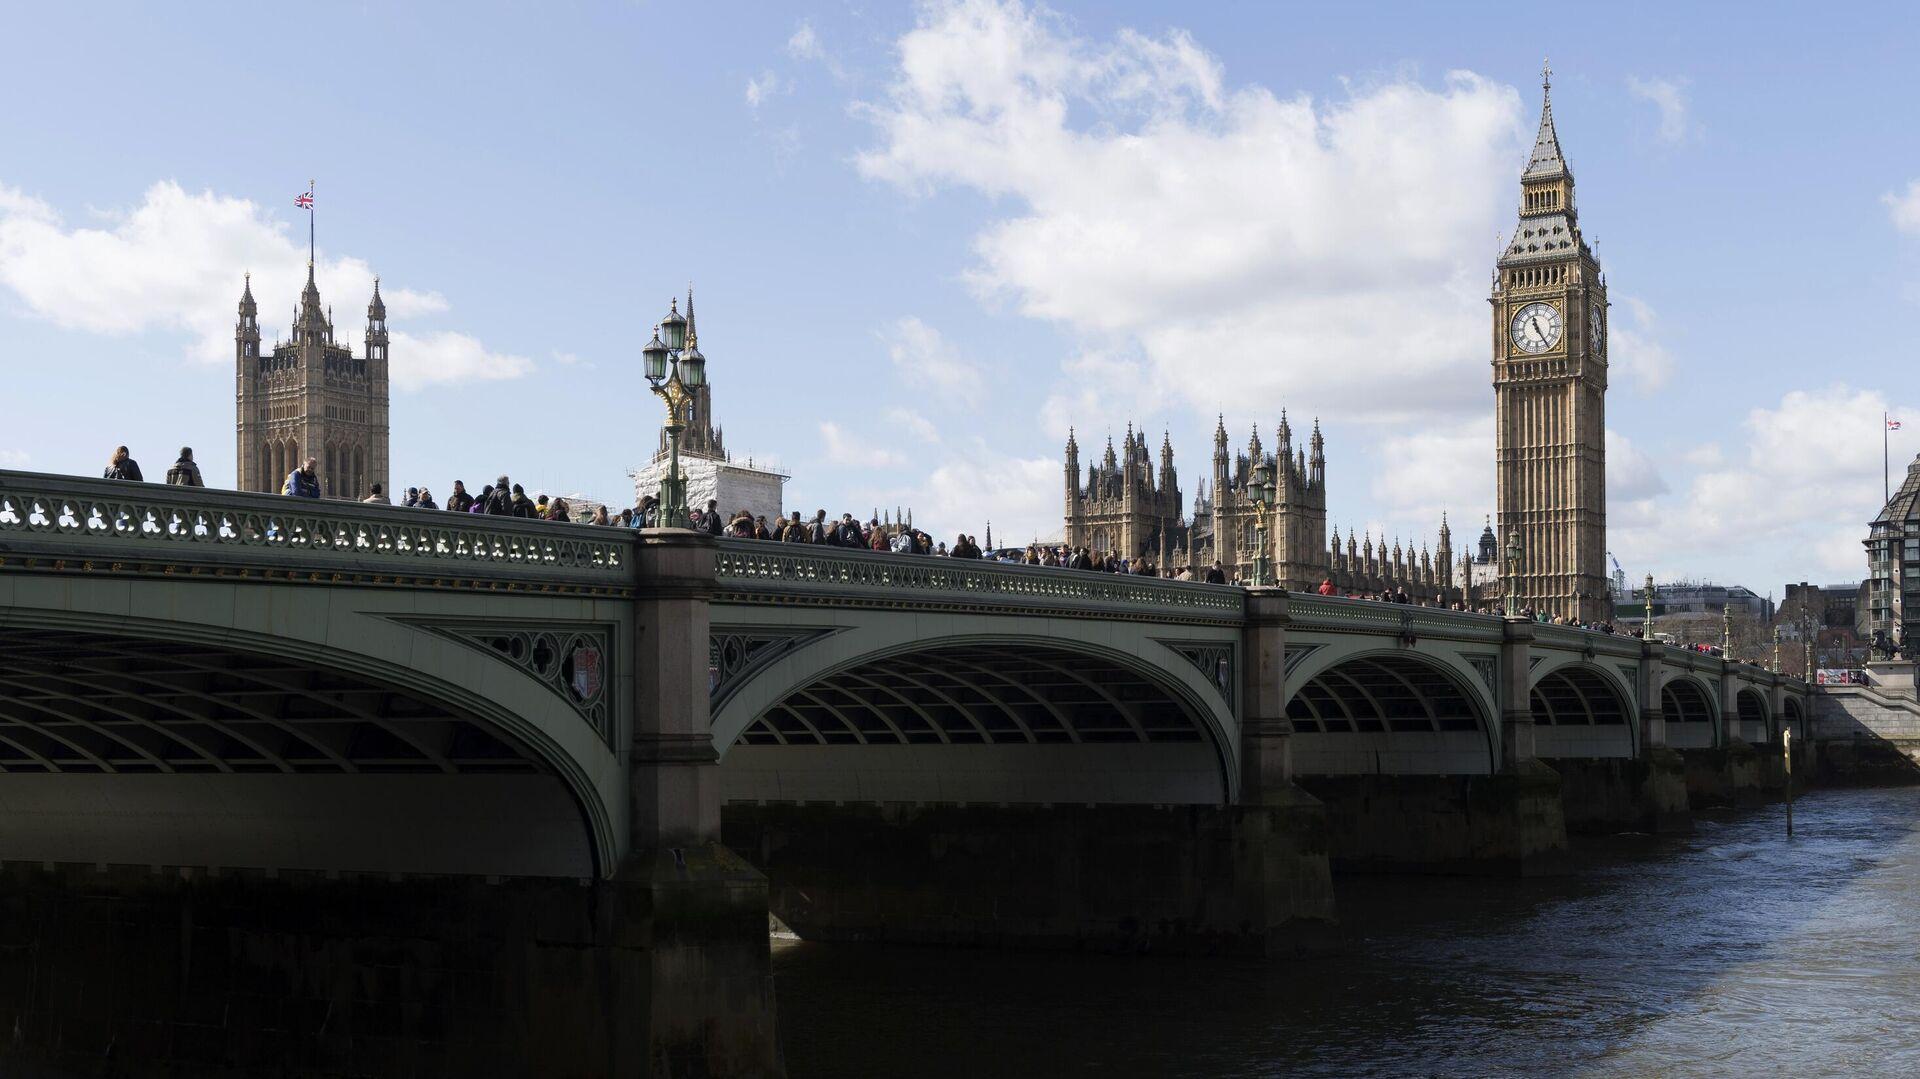 Вестминстерский мост через реку Темза в Лондоне - РИА Новости, 1920, 19.12.2020